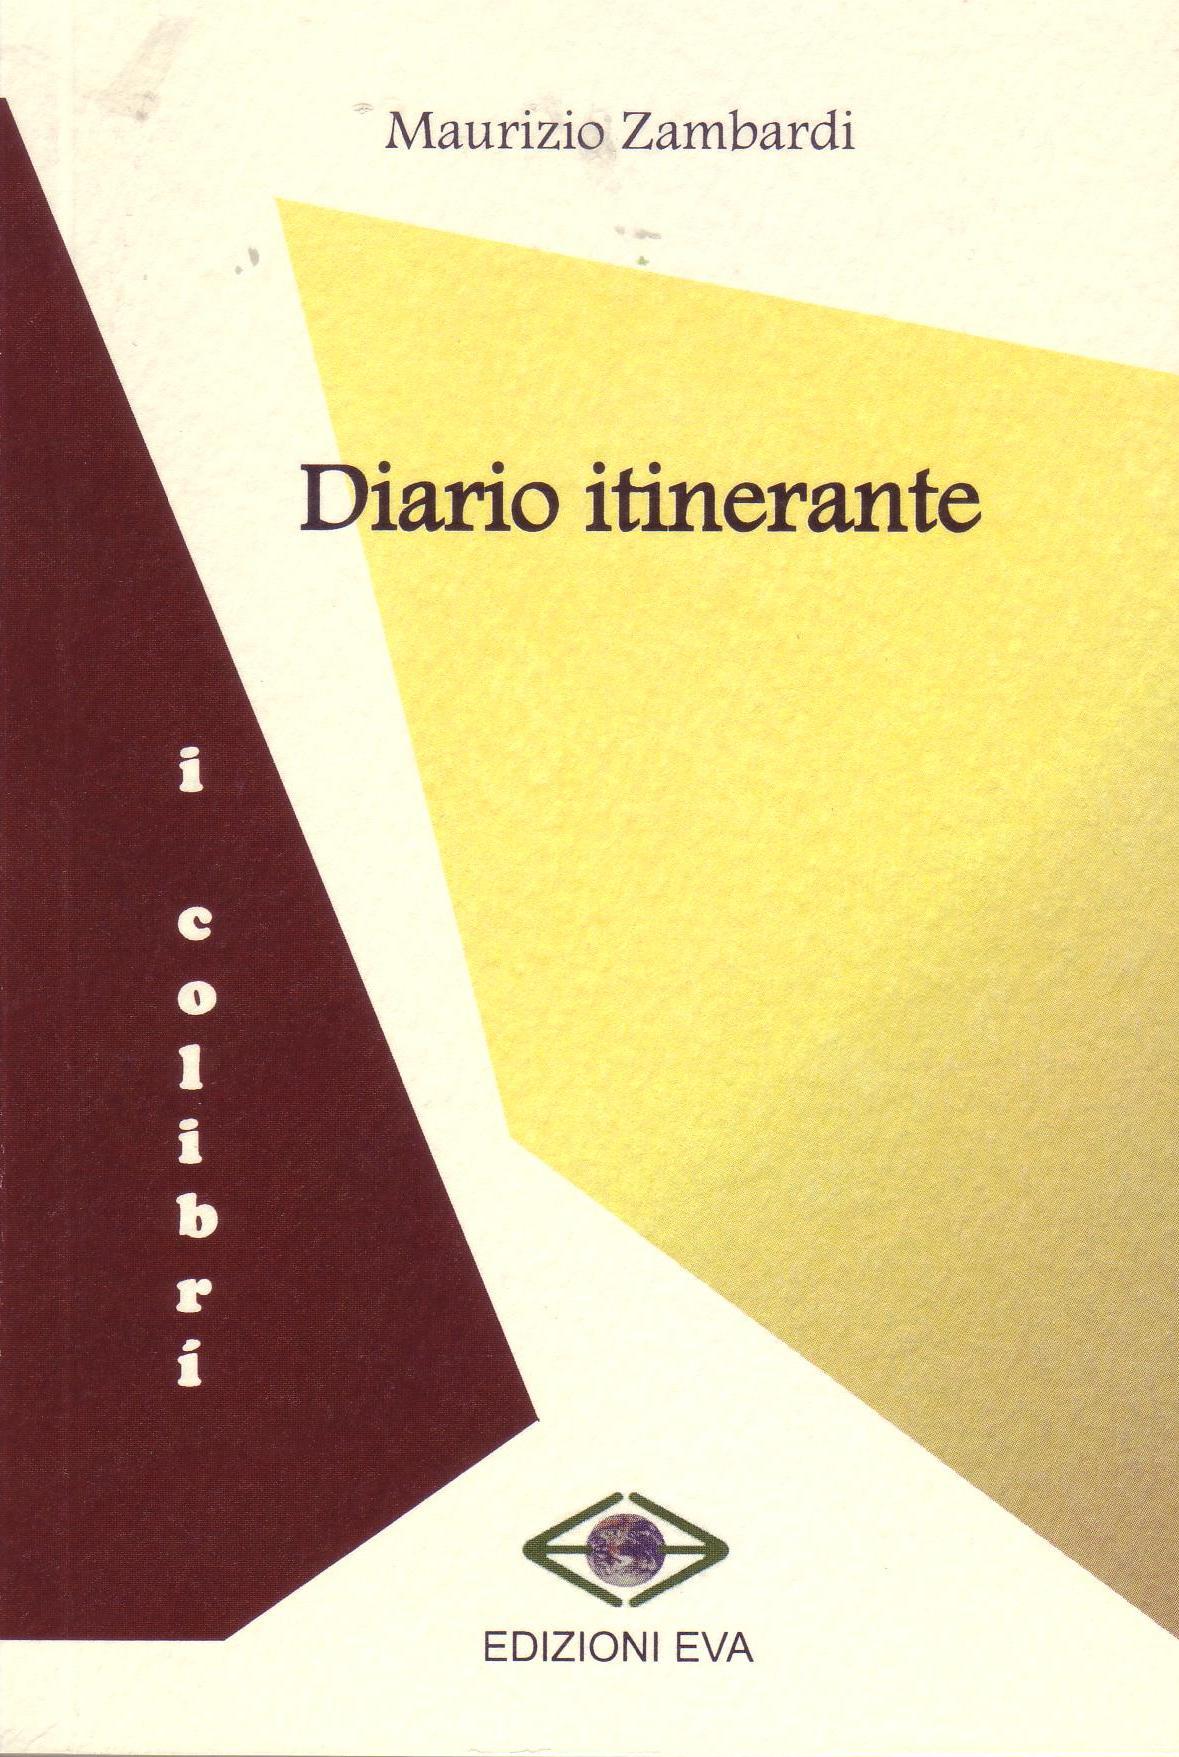 Cop Diario itinerante